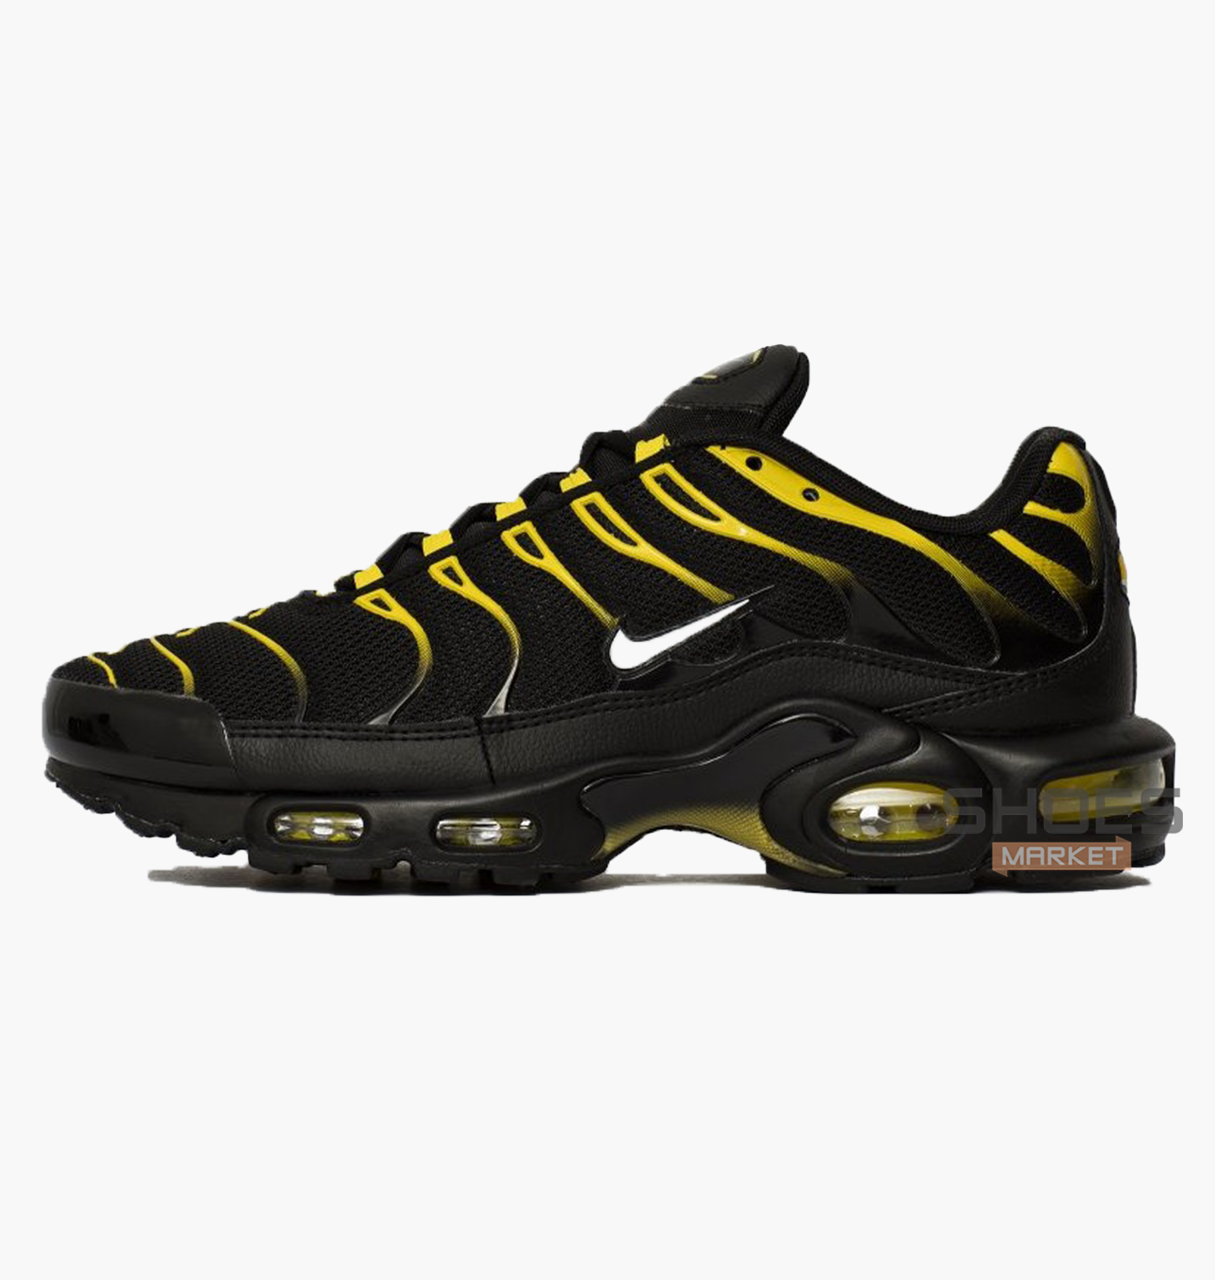 Мужские кроссовки Nike Air Max Plus Black/Yellow 852630-020, оригинал